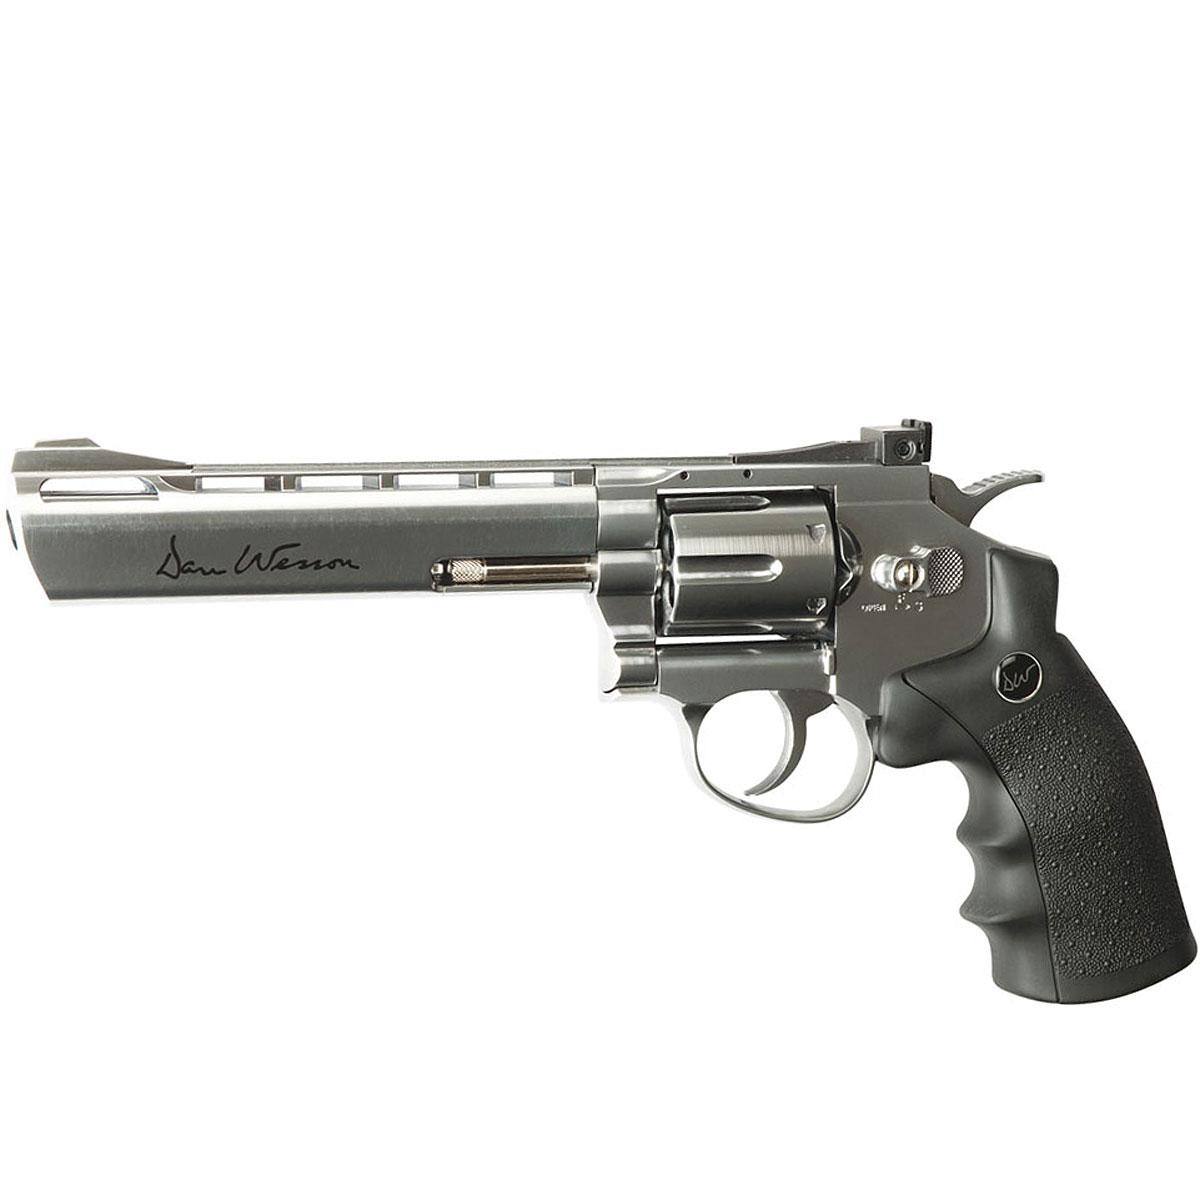 ASG Dan Wesson 6inch револьвер пневматический CO2, 4,5 мм, цвет: Silver (16559) цена